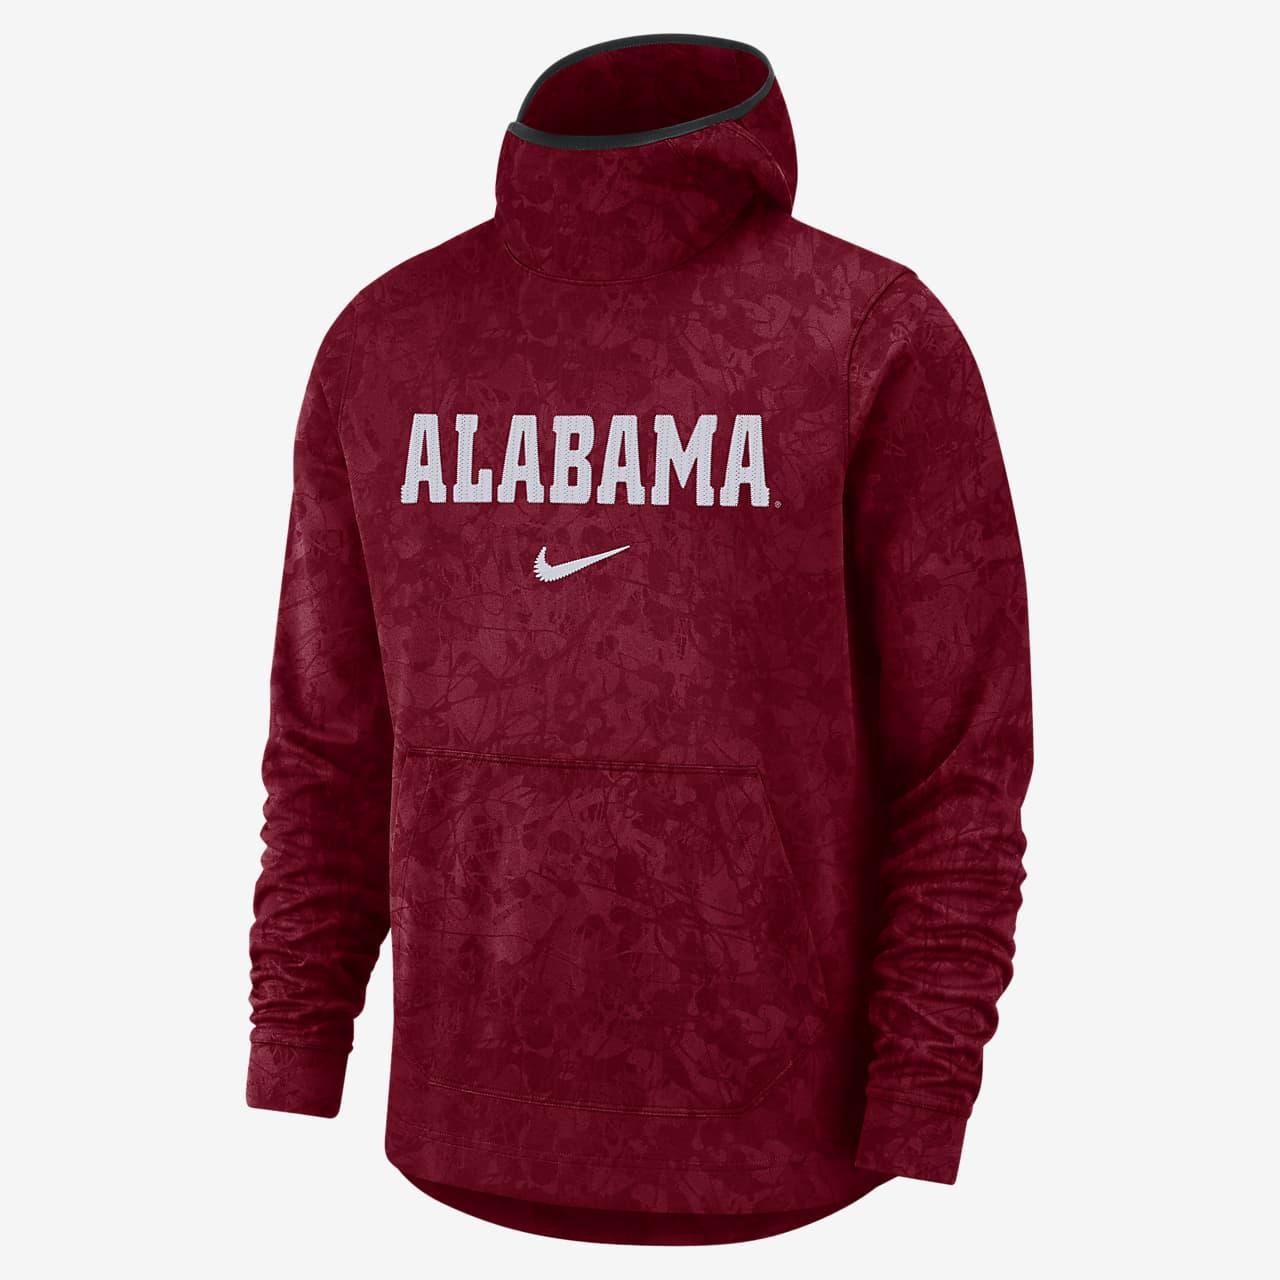 Nike College Dri-FIT Spotlight (Alabama) Men's Pullover Basketball Hoodie